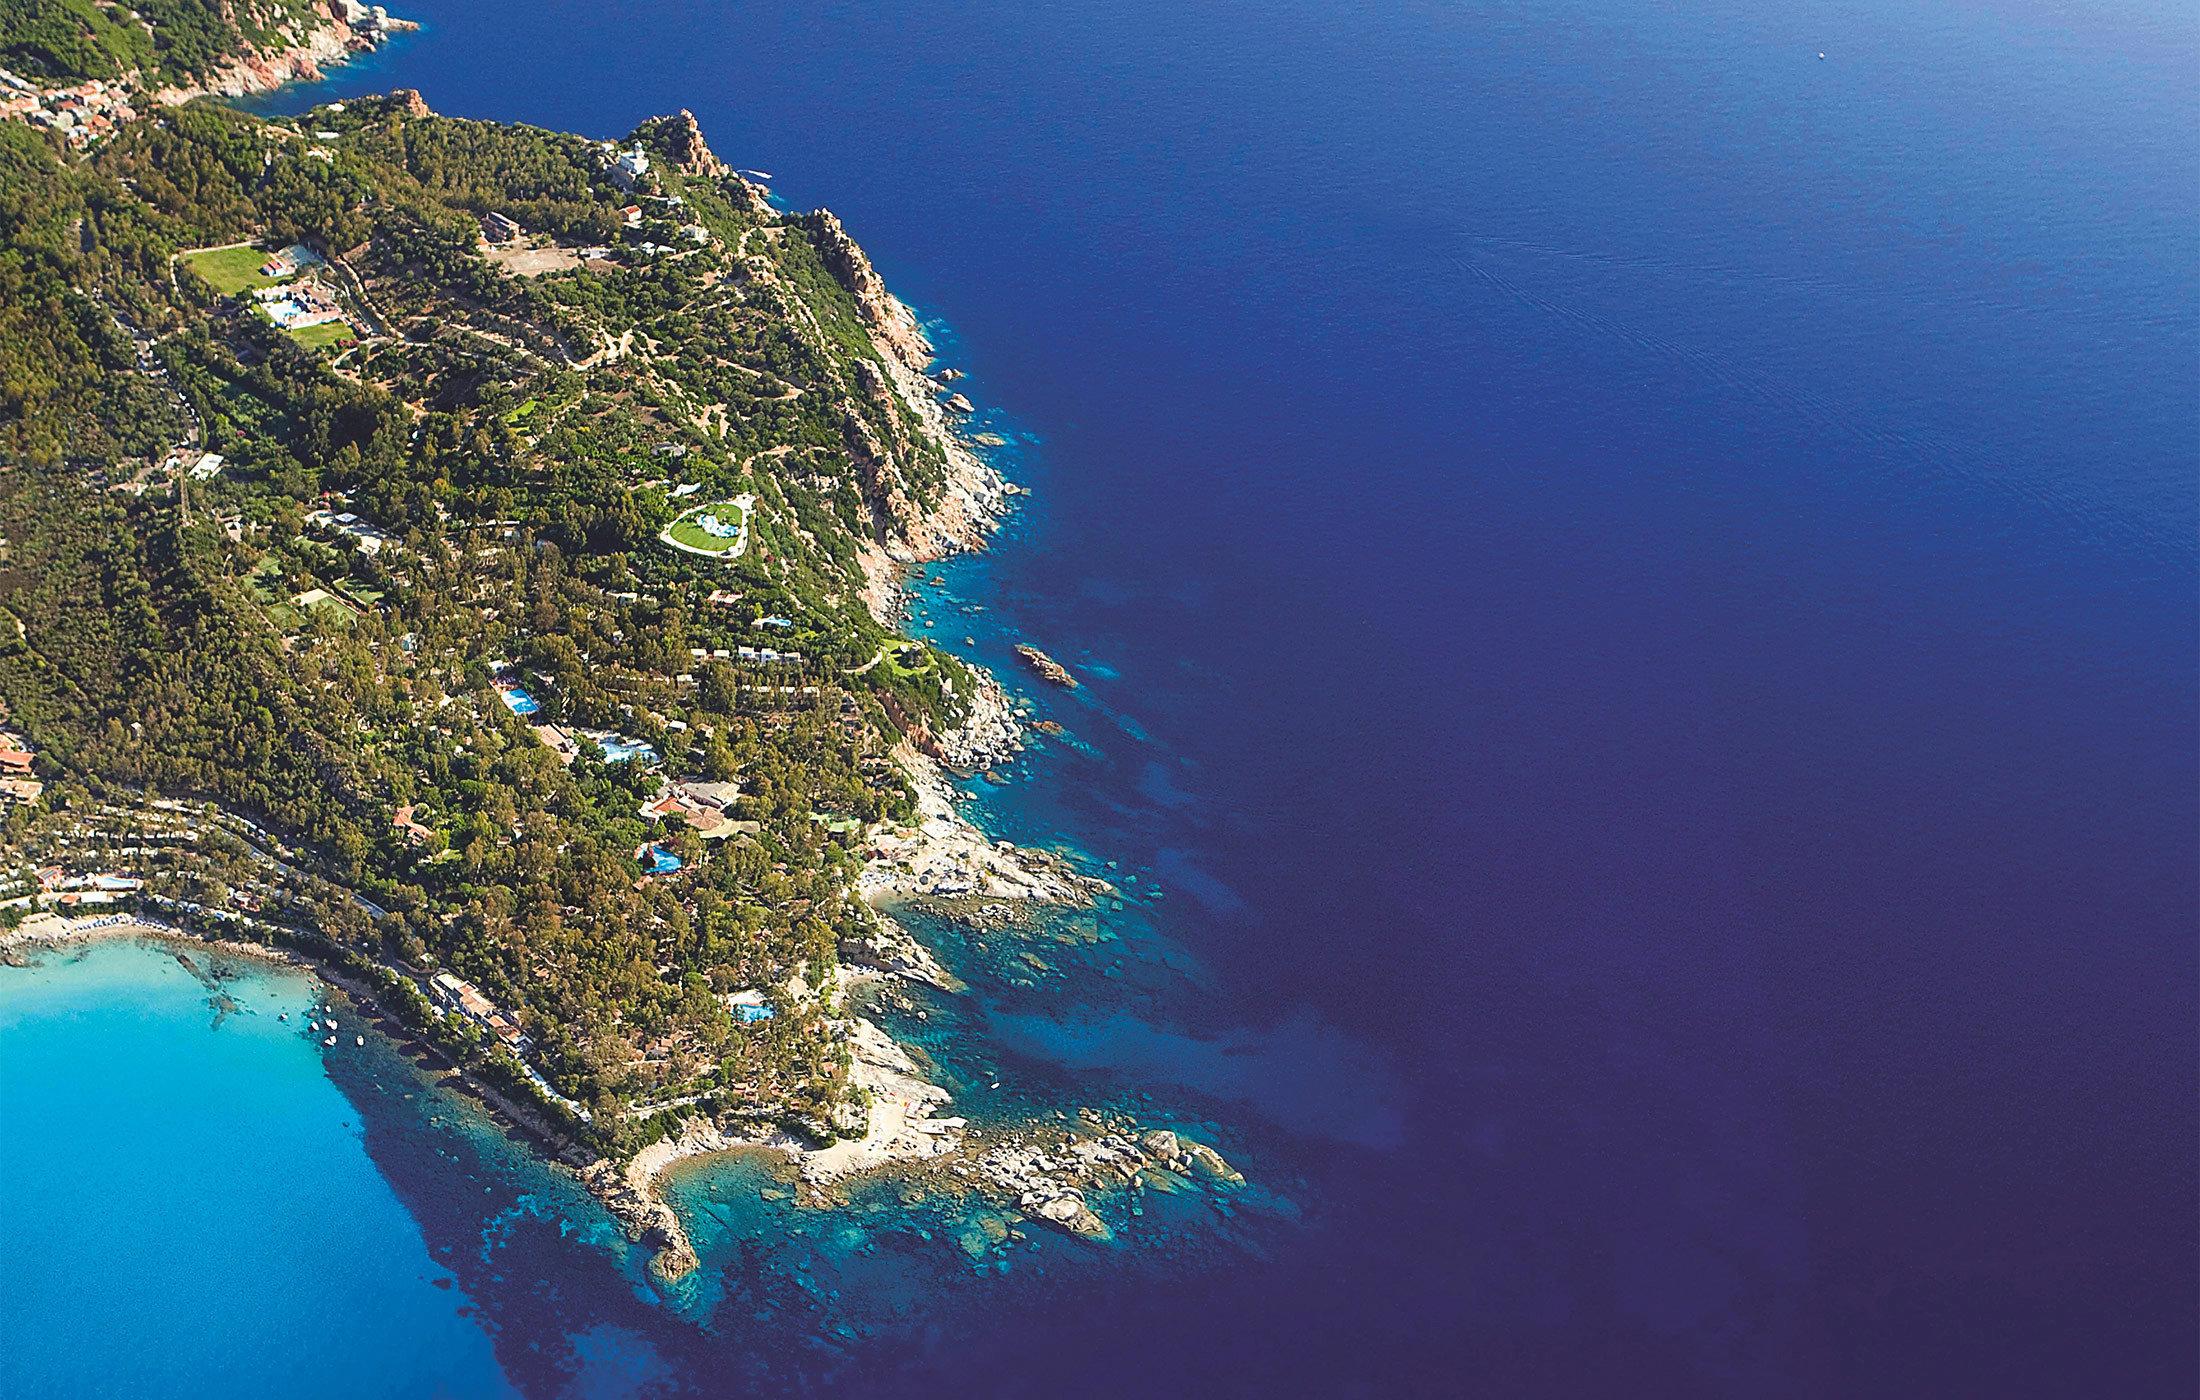 water Sea Nature archipelago Ocean reef Coast aerial photography atmosphere of earth islet Island vehicle underwater terrain cape hillside